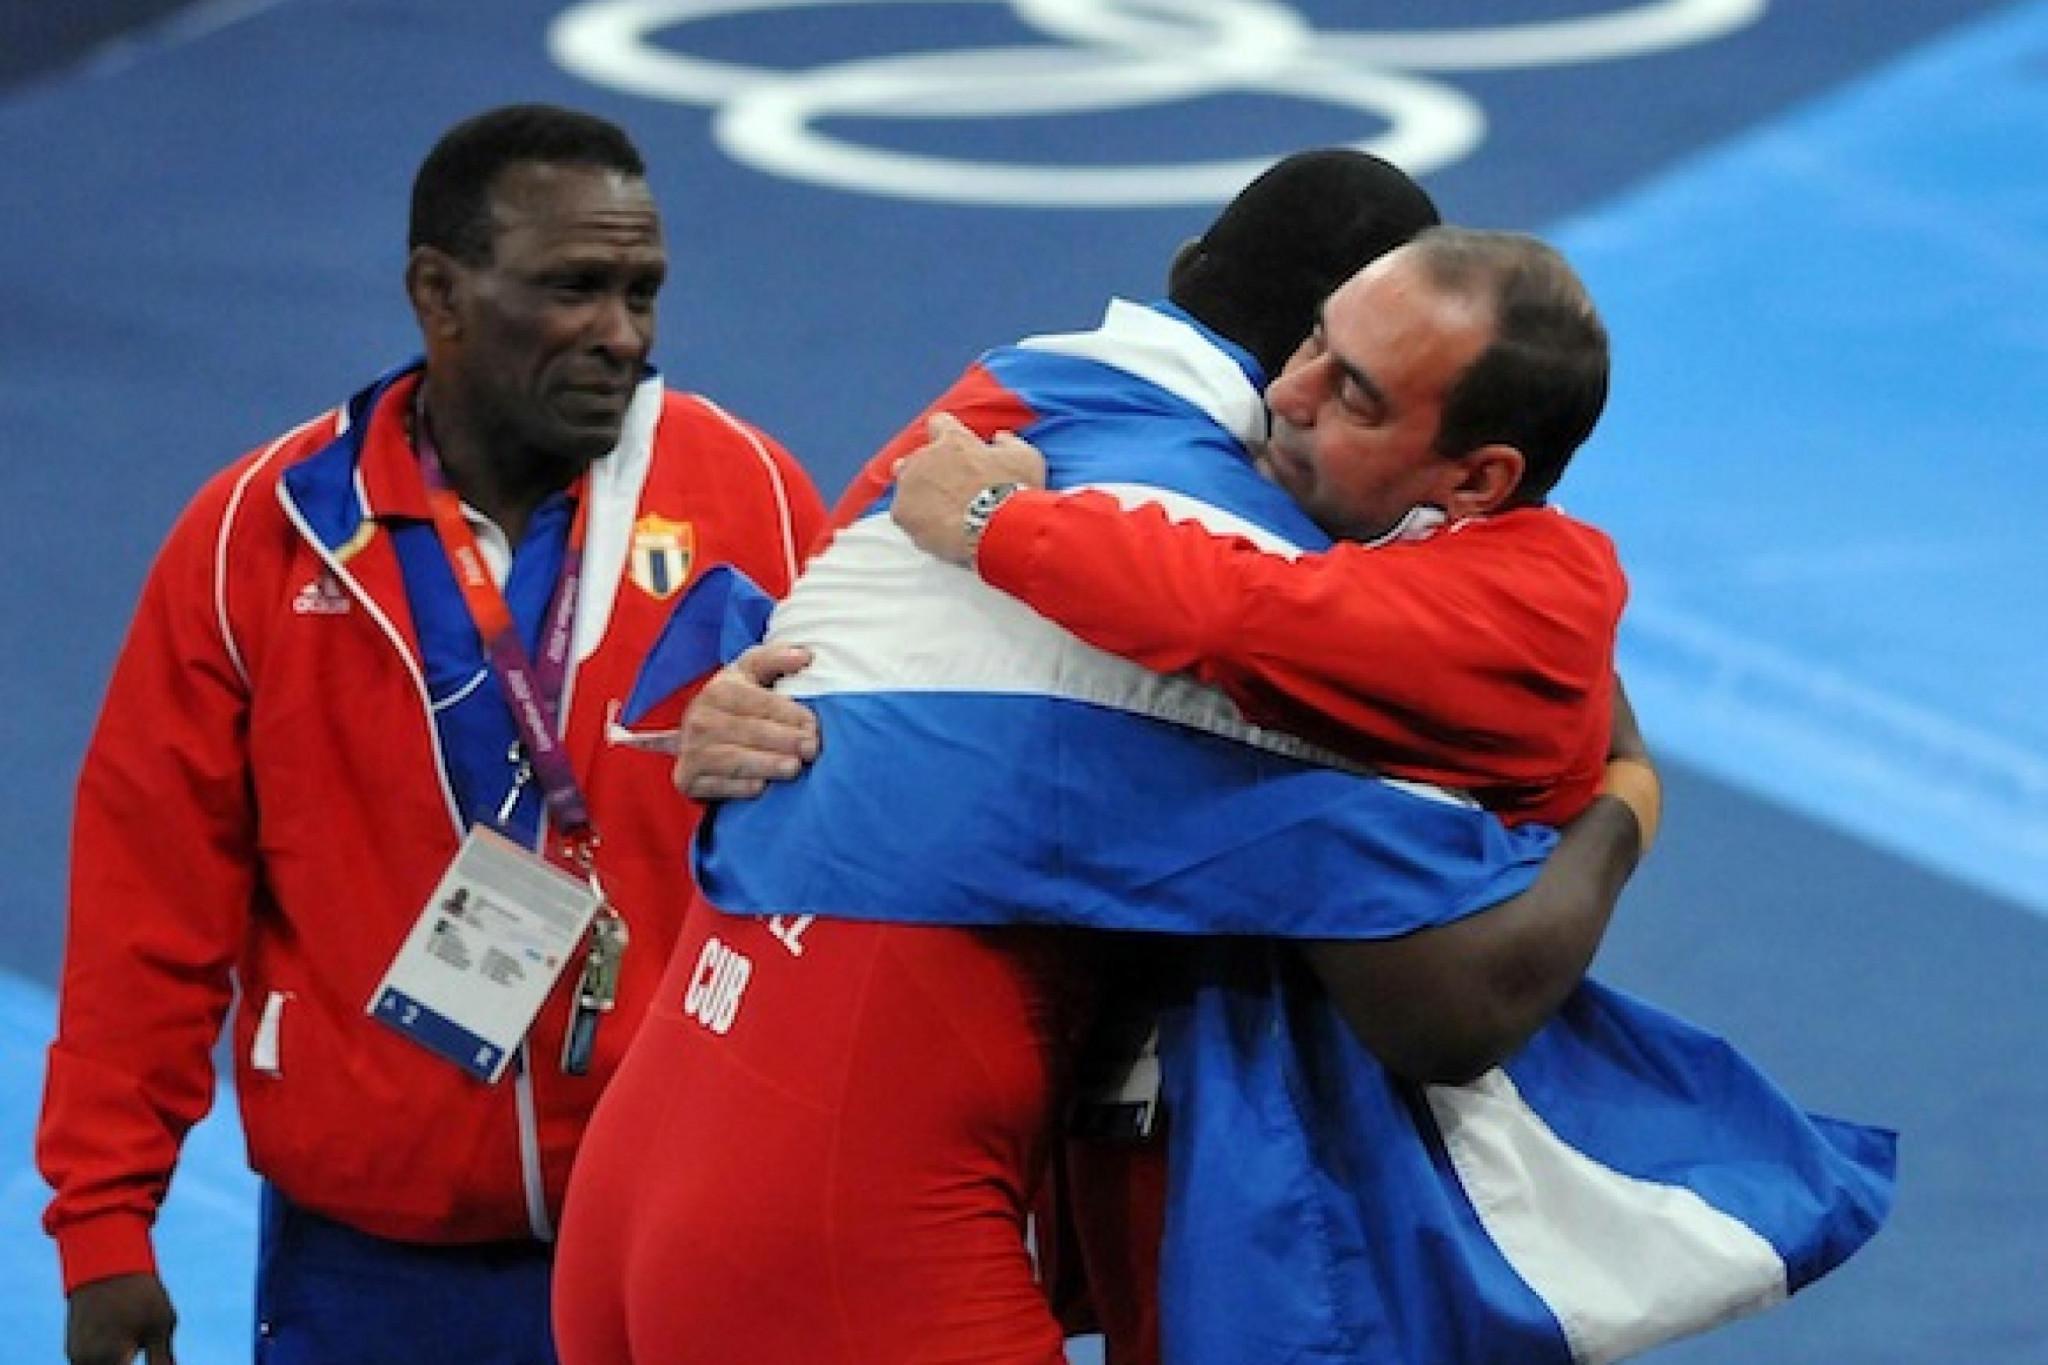 UWW lead tributes after legendary Cuban wrestling coach Bragueira dies aged 65